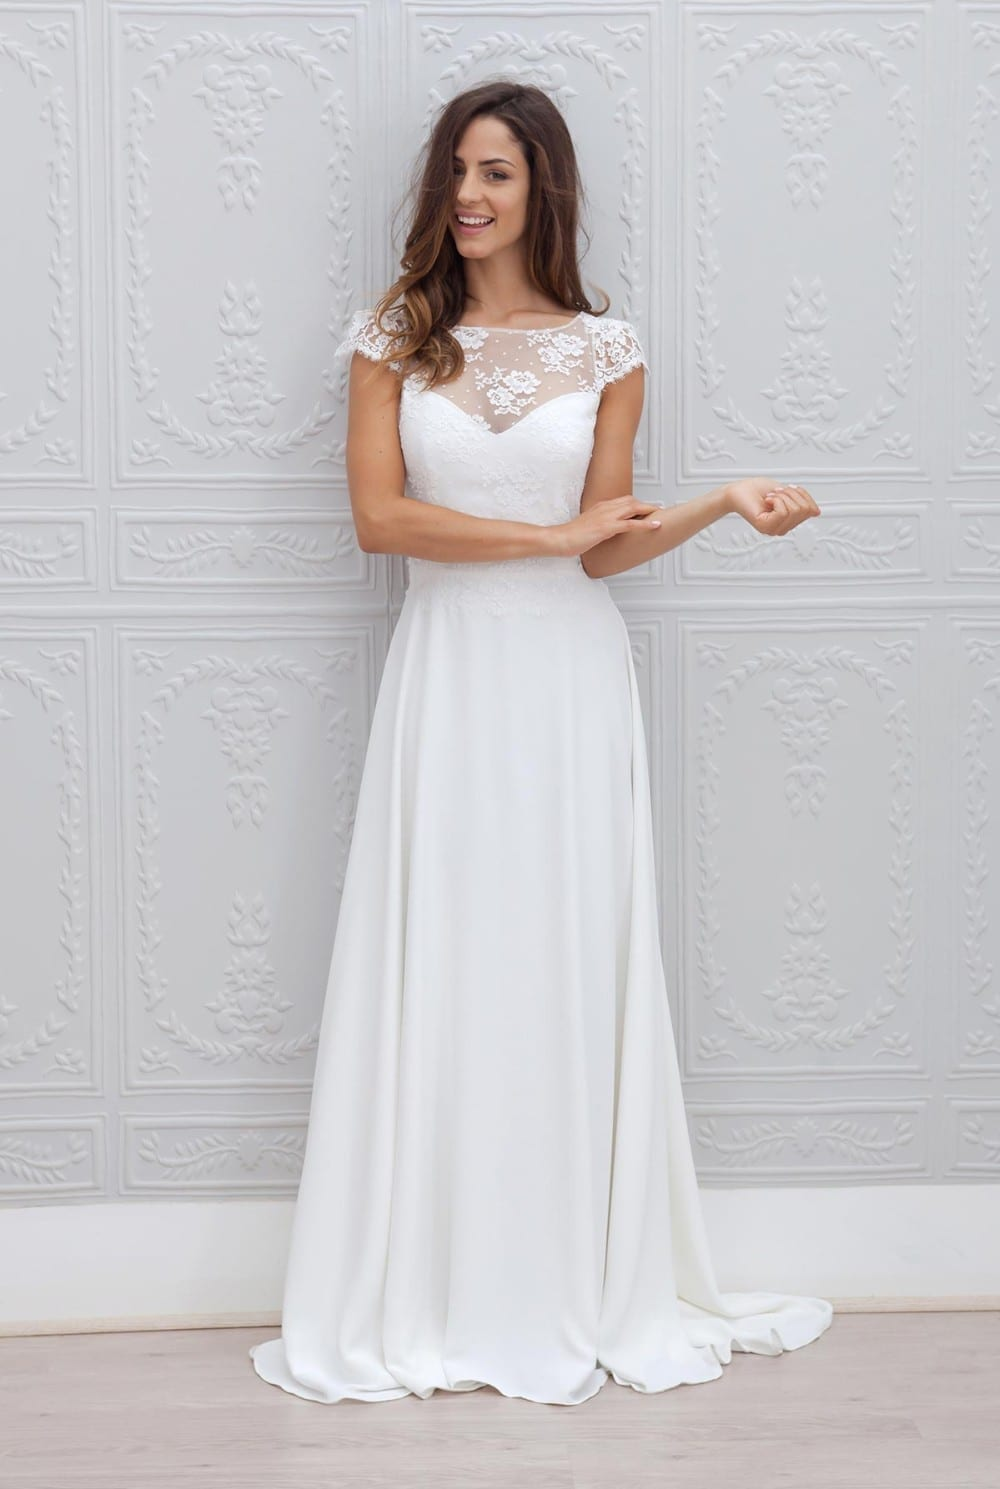 Vintage A Line Bateau Appliqued With Short Sleeve Beach Wedding Dress